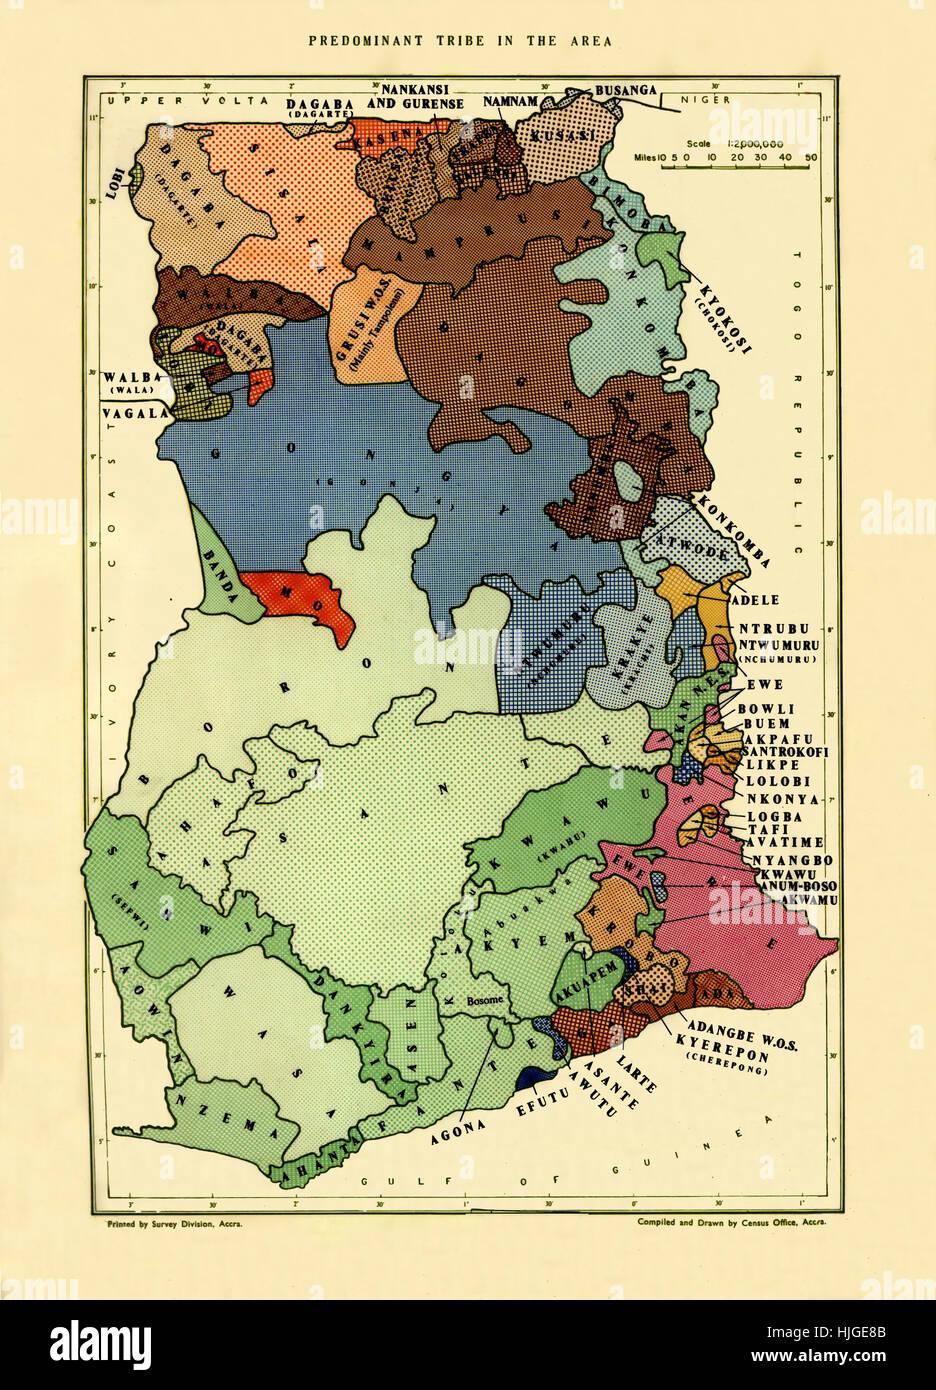 Tribal Map Of Ghana Stock Photos & Tribal Map Of Ghana Stock Images ...